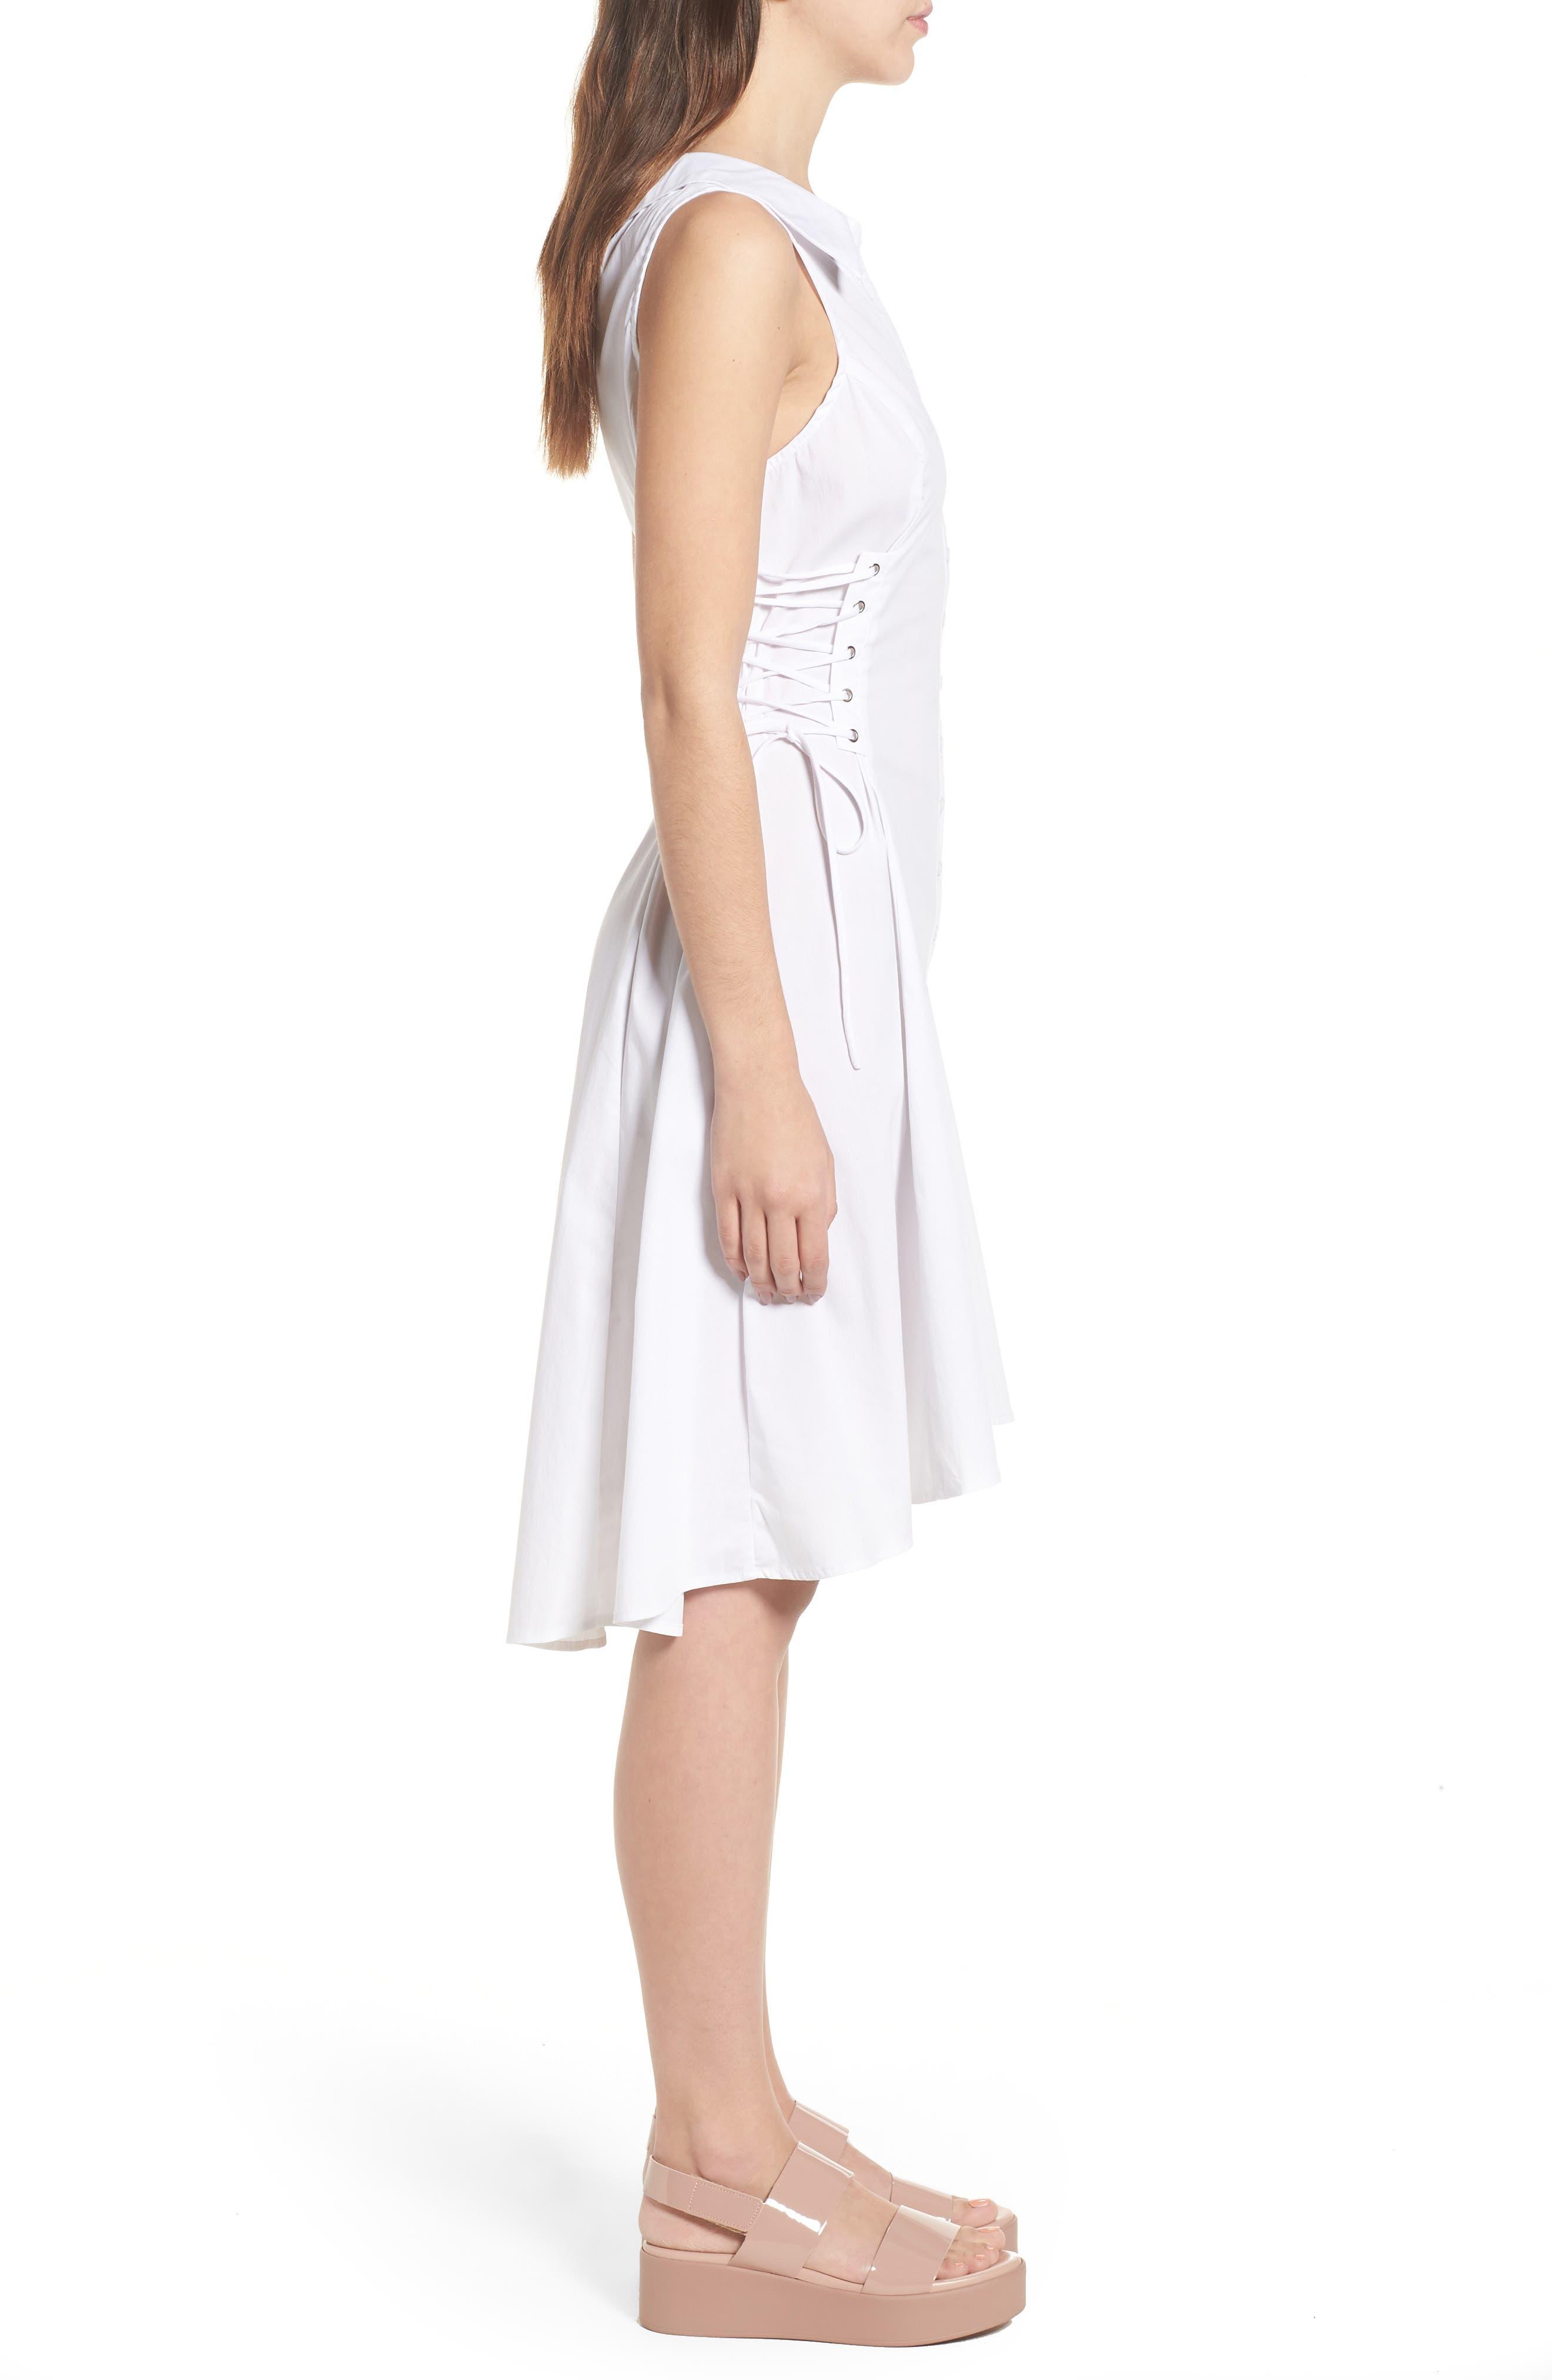 Sydney Lace Side Dress,                             Alternate thumbnail 3, color,